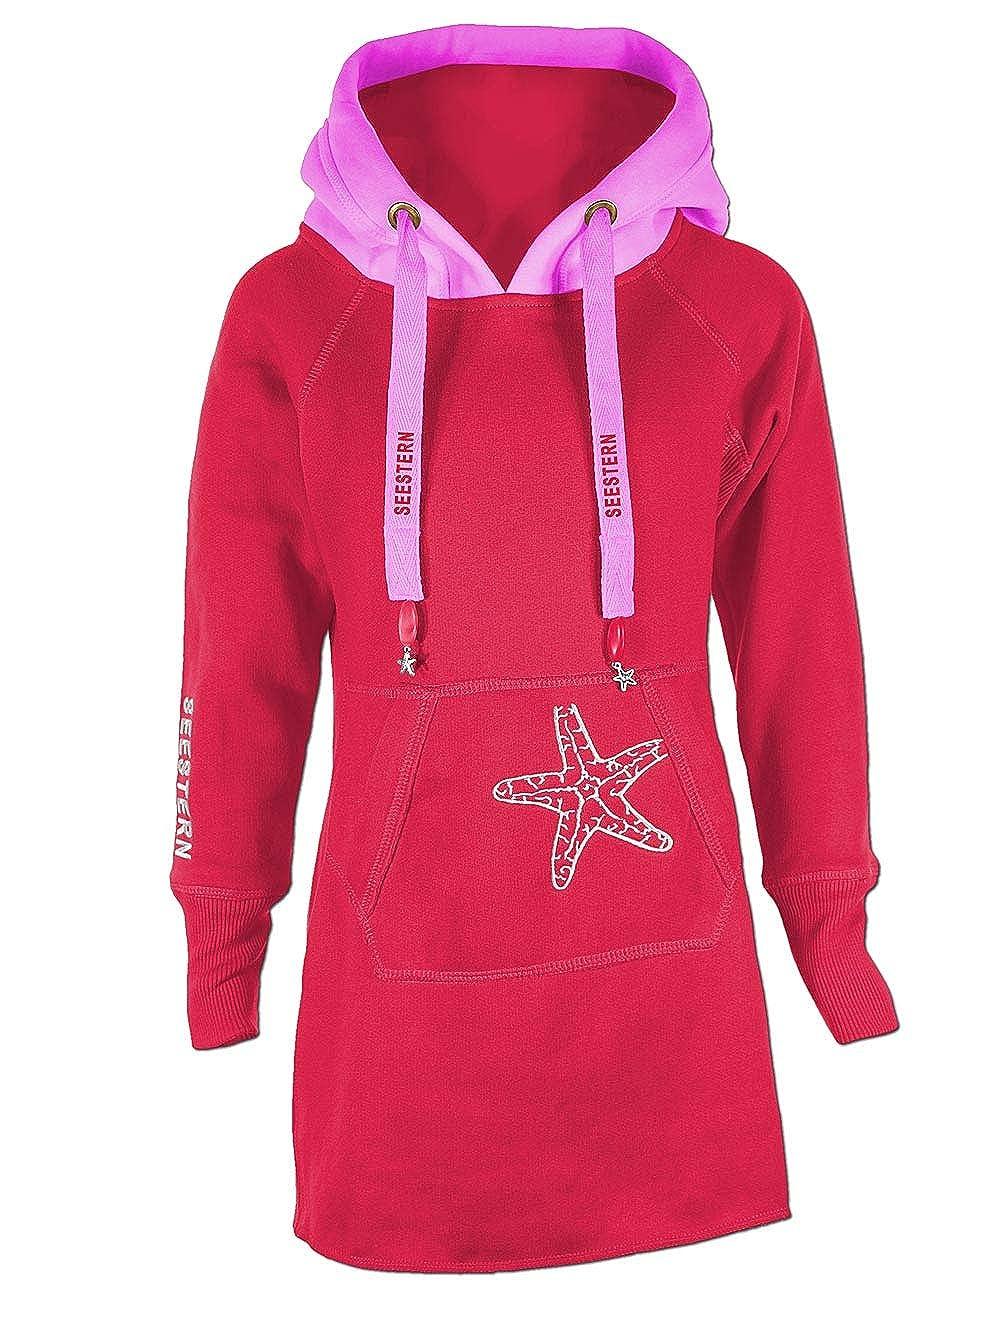 SEESTERN Kinder Langes Kapuzen Sweat Shirt Pullover Hoody Sweater Gr.116-164/1805.rd_pk SW1805.rd_pk